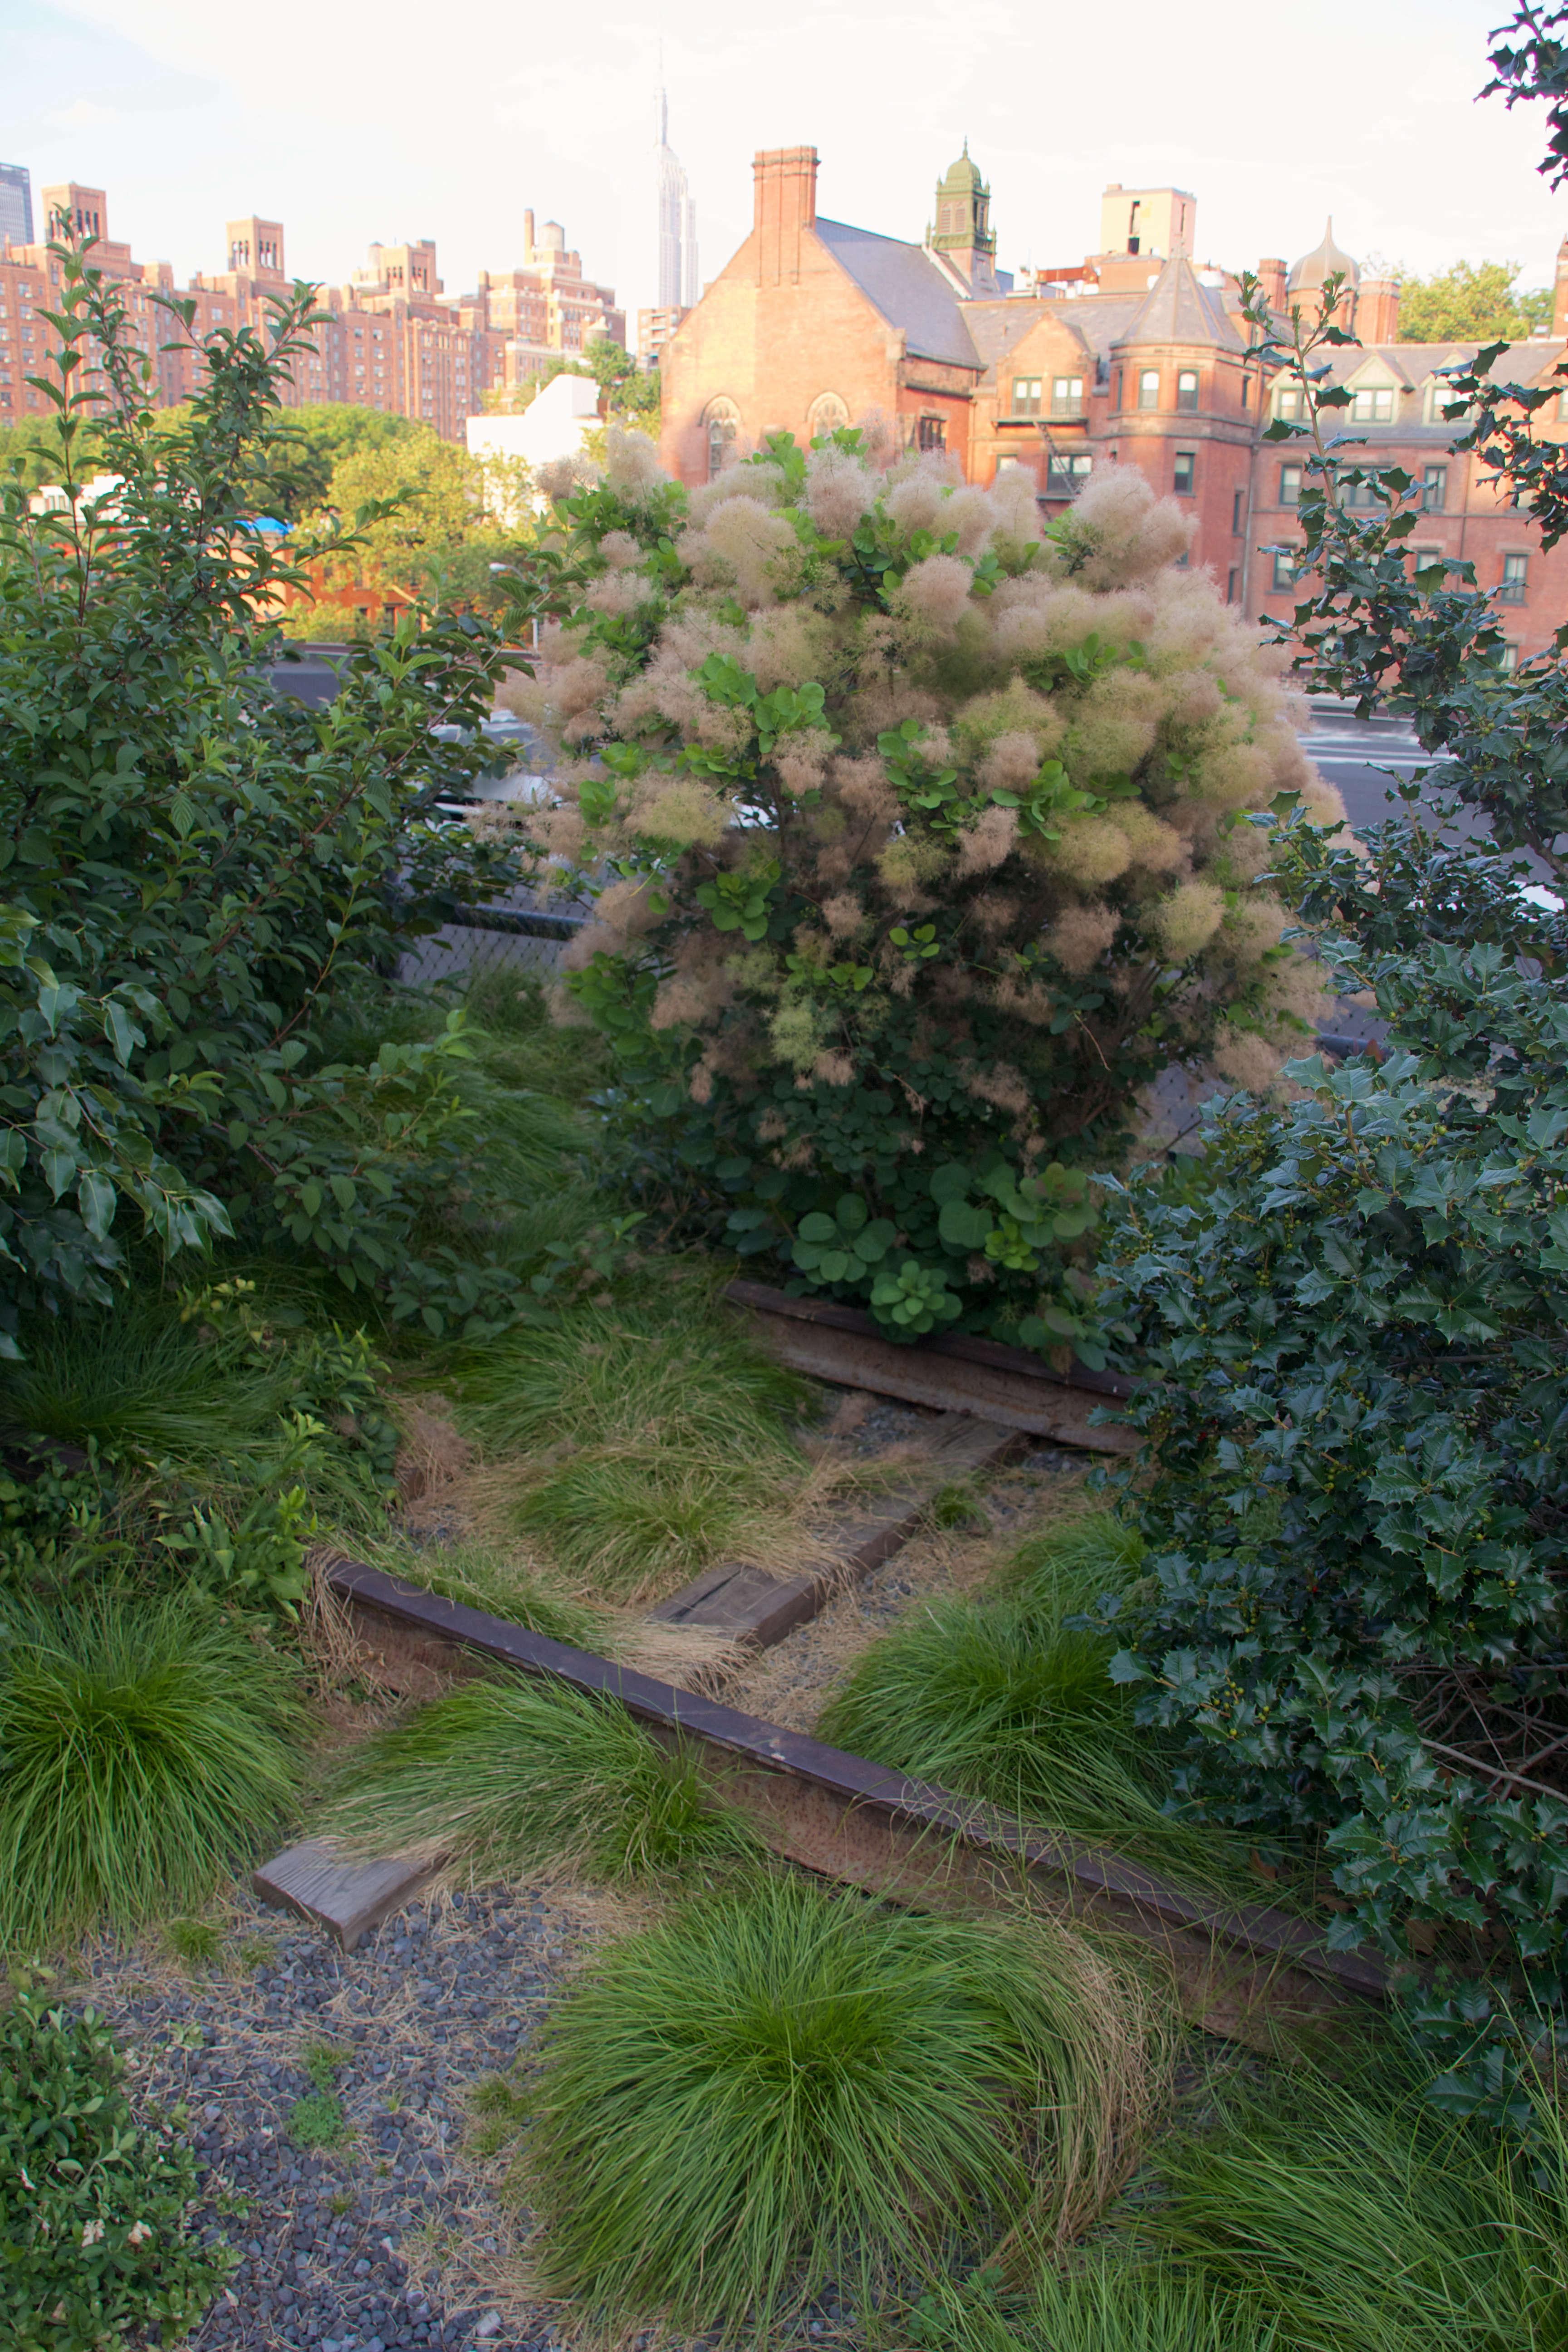 New Garden Ideas 2015 best new garden ideas ideas - home decorating ideas and interior